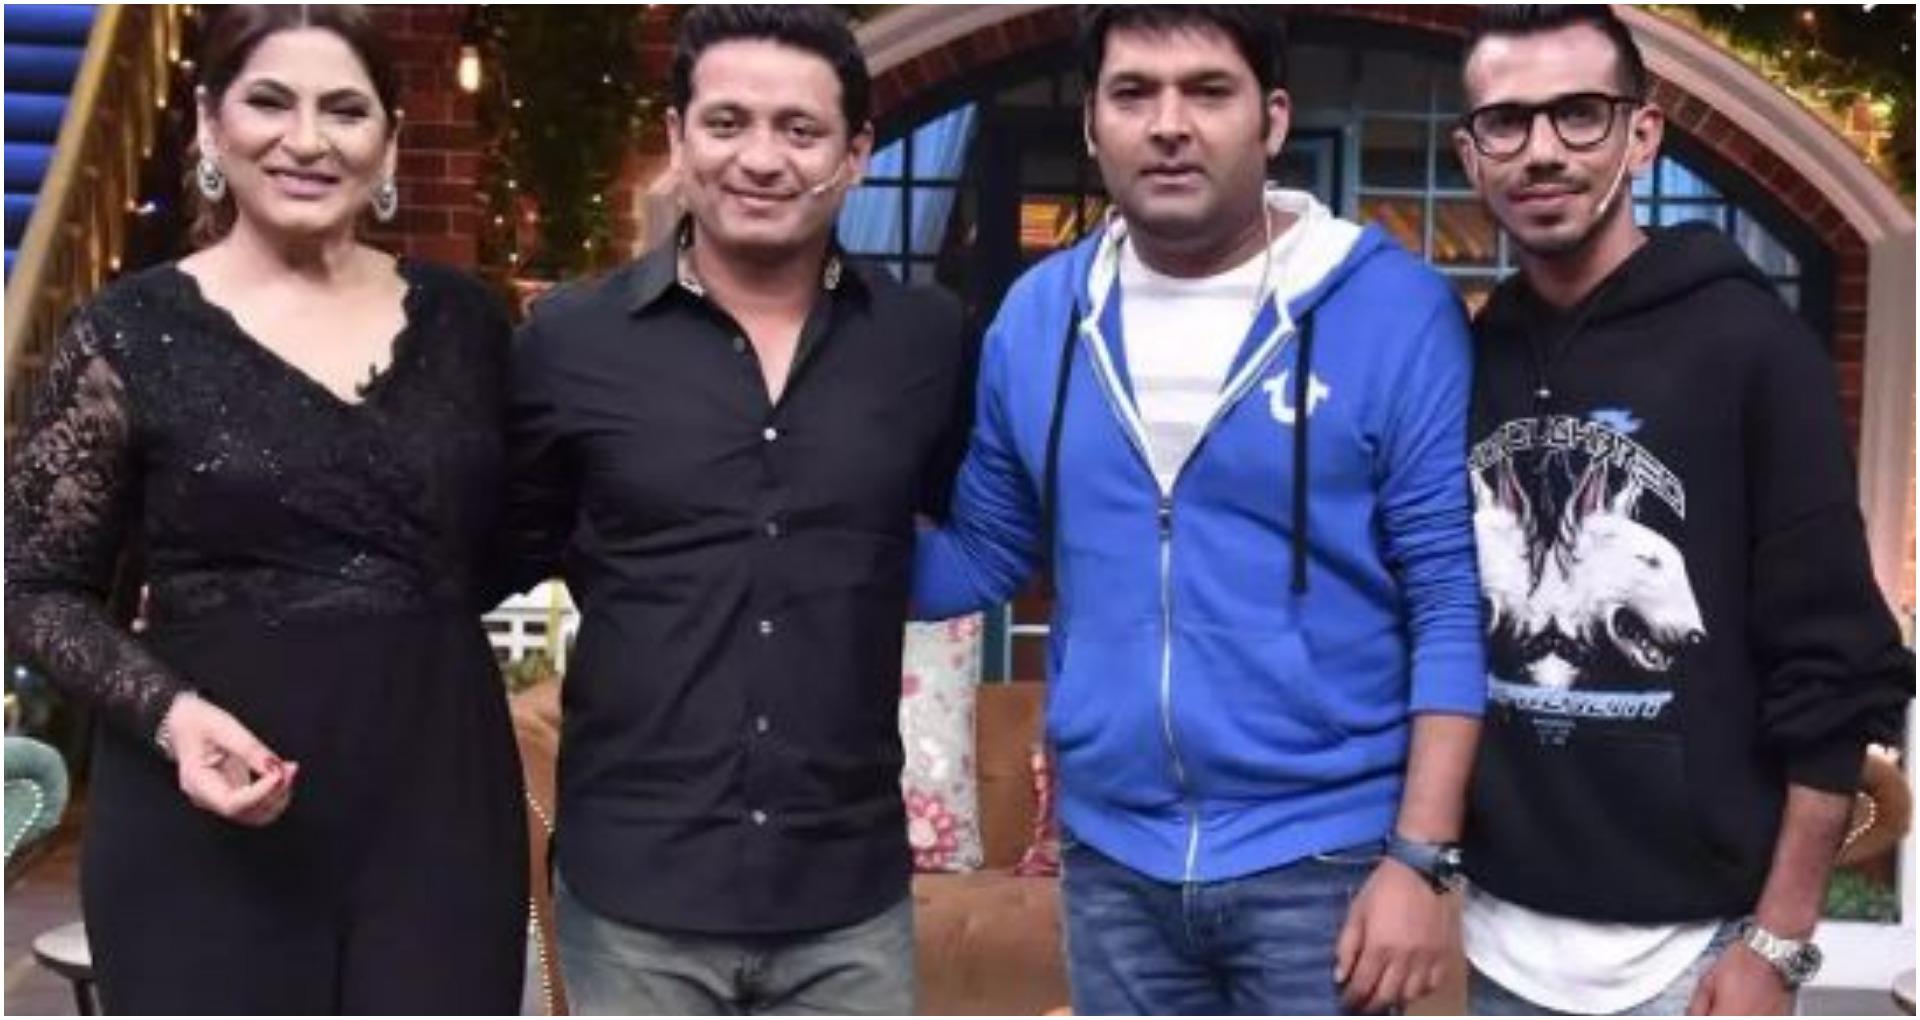 'The Kapil Sharma Show' में पहुंचे युजवेंद्र चहल और पीयूष चावला, चहल ने किये कई बड़े खुलासे